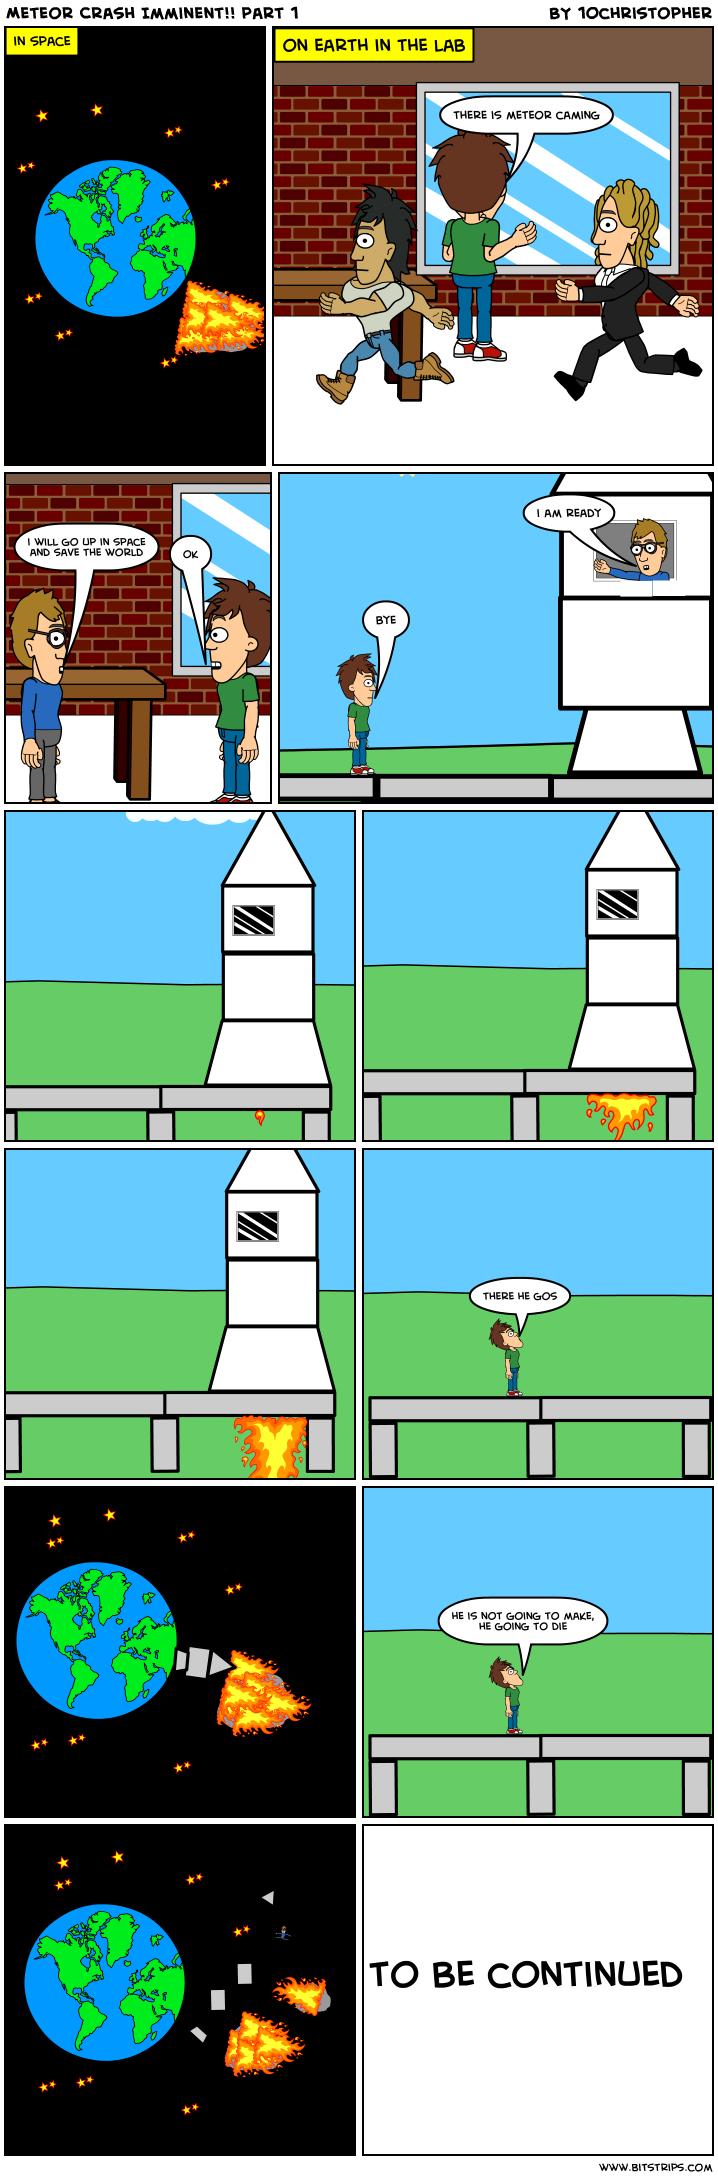 Meteor Crash Imminent!! part 1